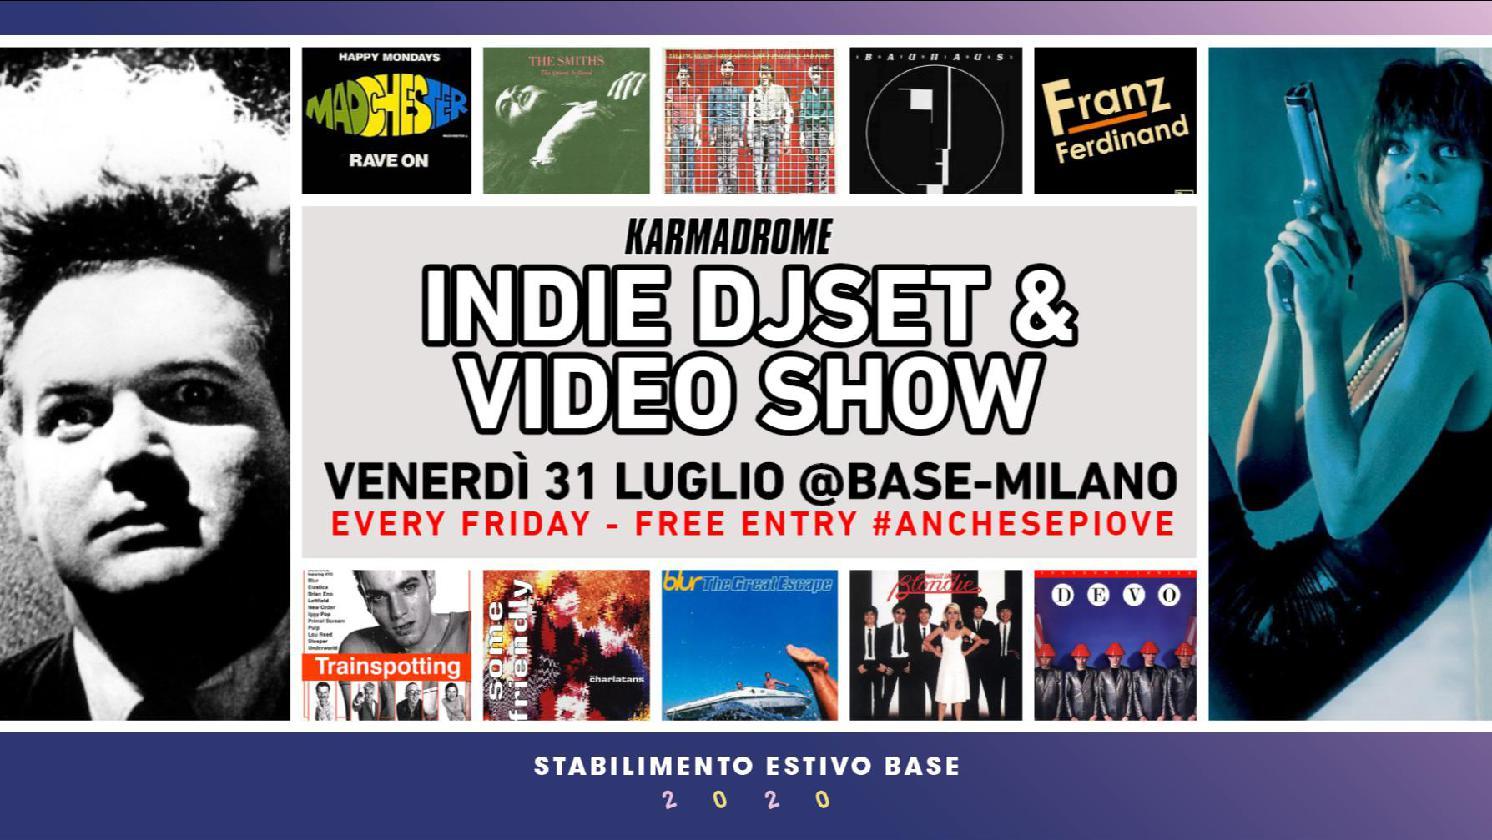 Karmadrome: Indie Djset + Video Show @Base-Milano